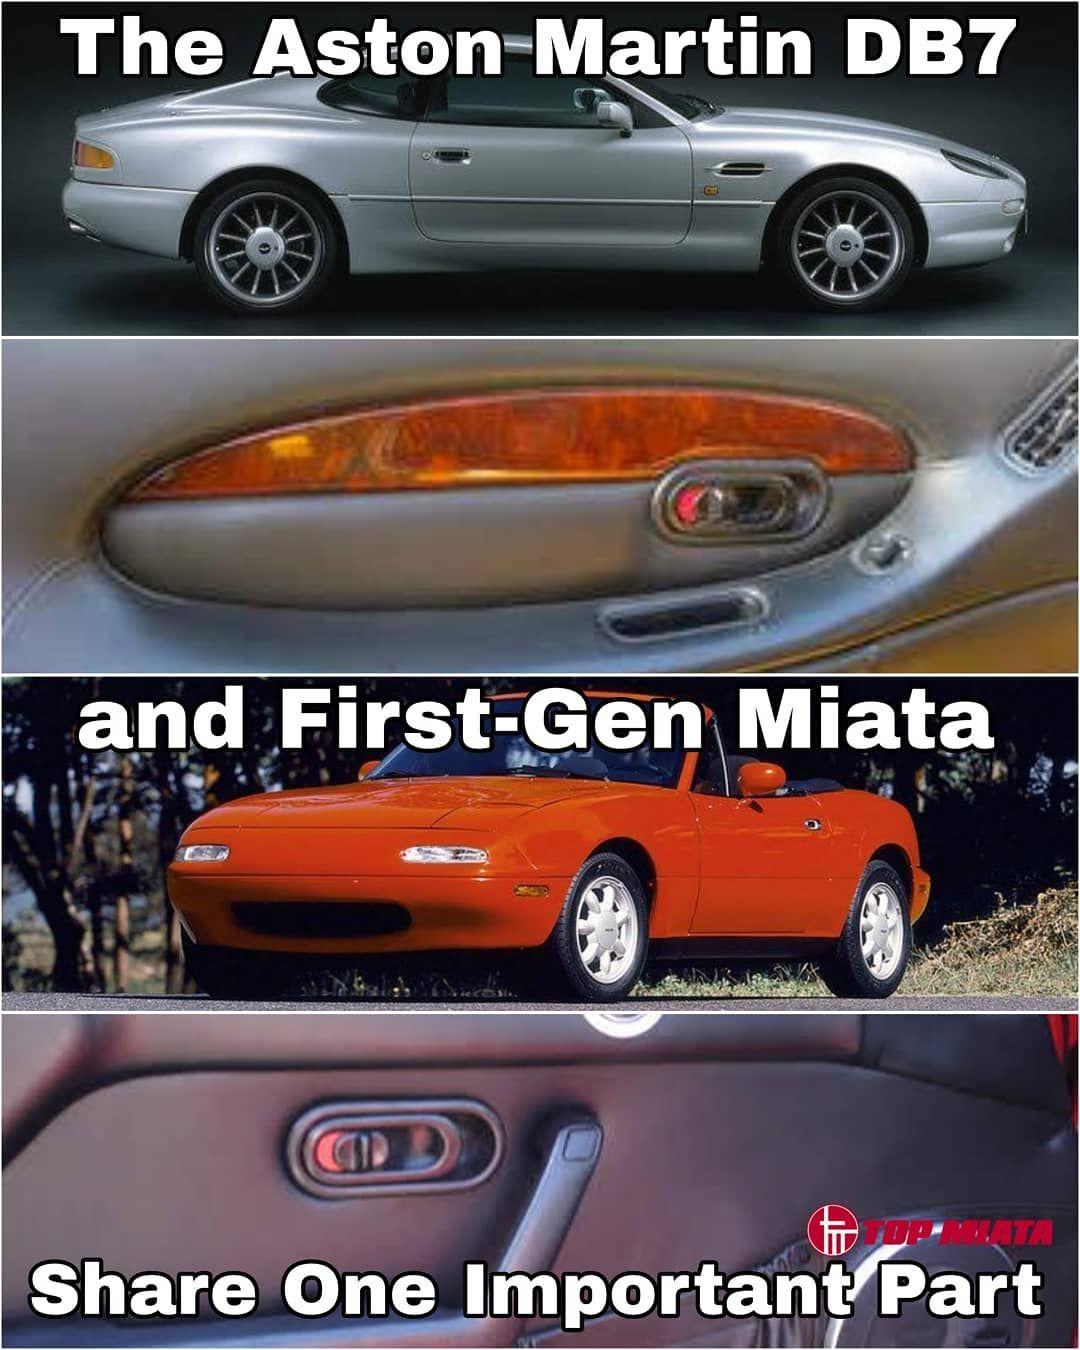 Topmiata On Instagram Mazda Miata Mx 5 Topmiata Mazda Miata Miata Mazda Mx5